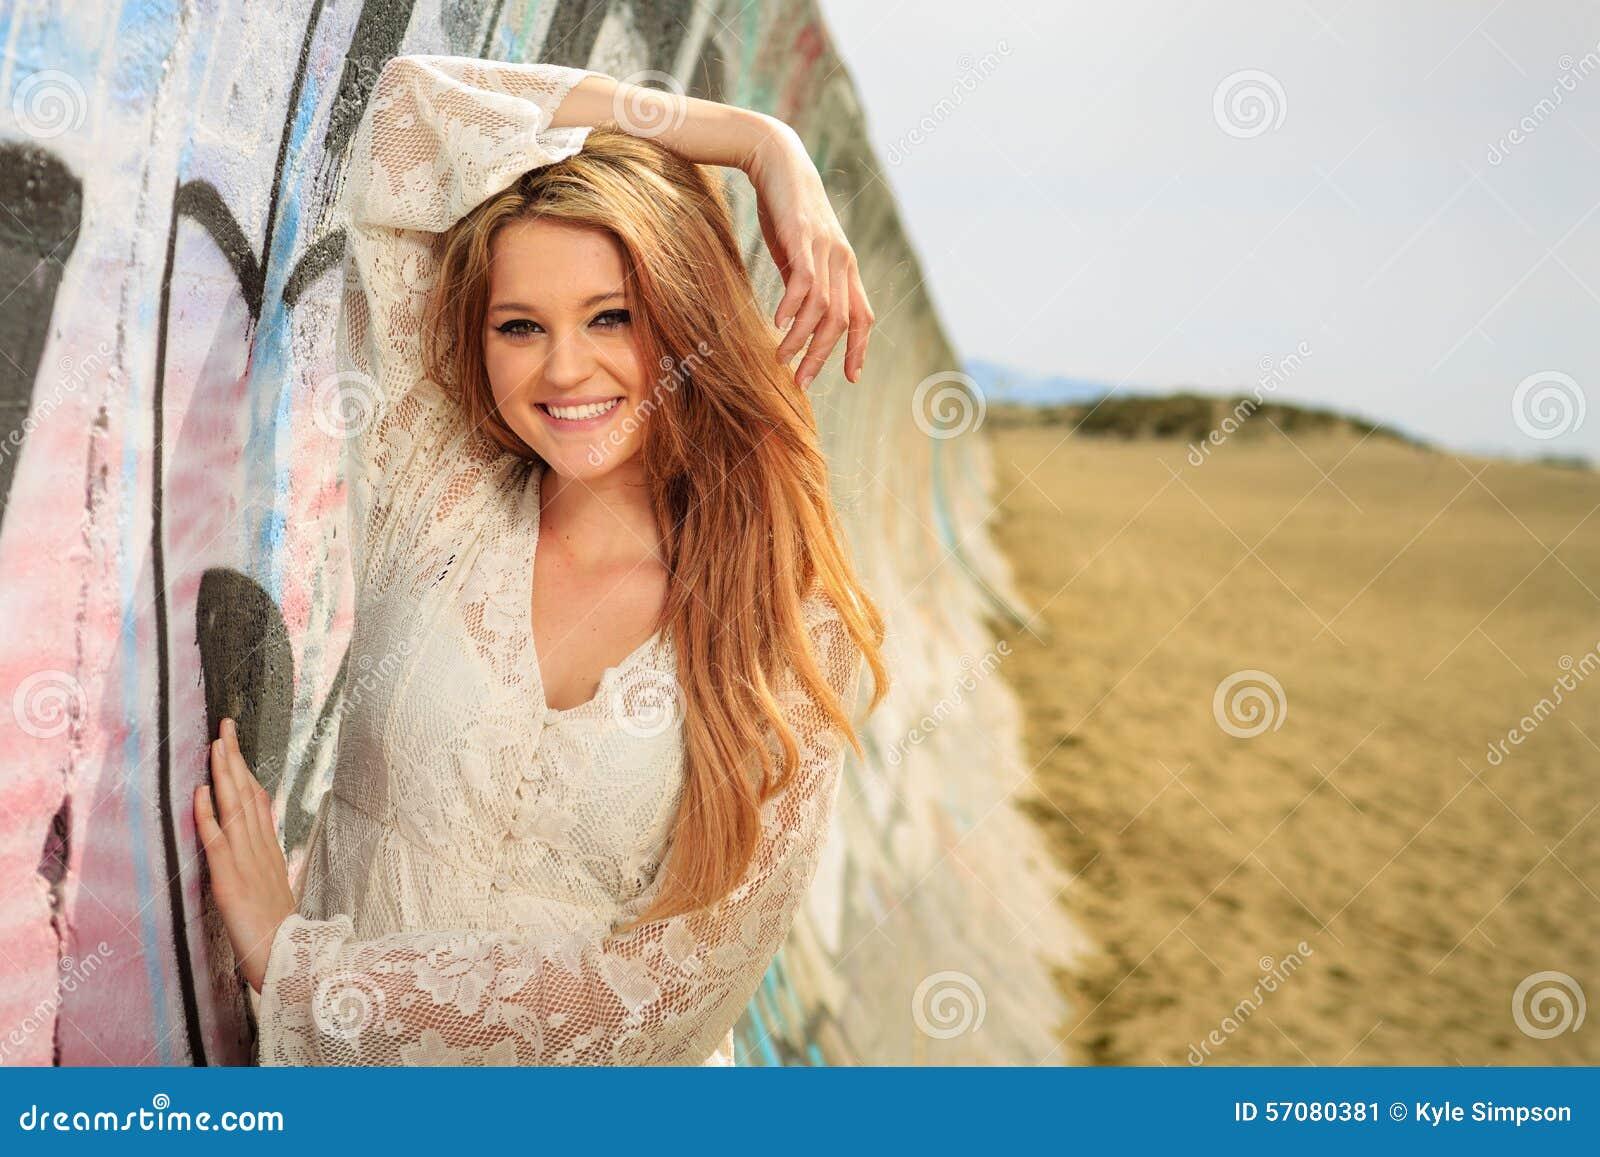 sexy beach teen pics